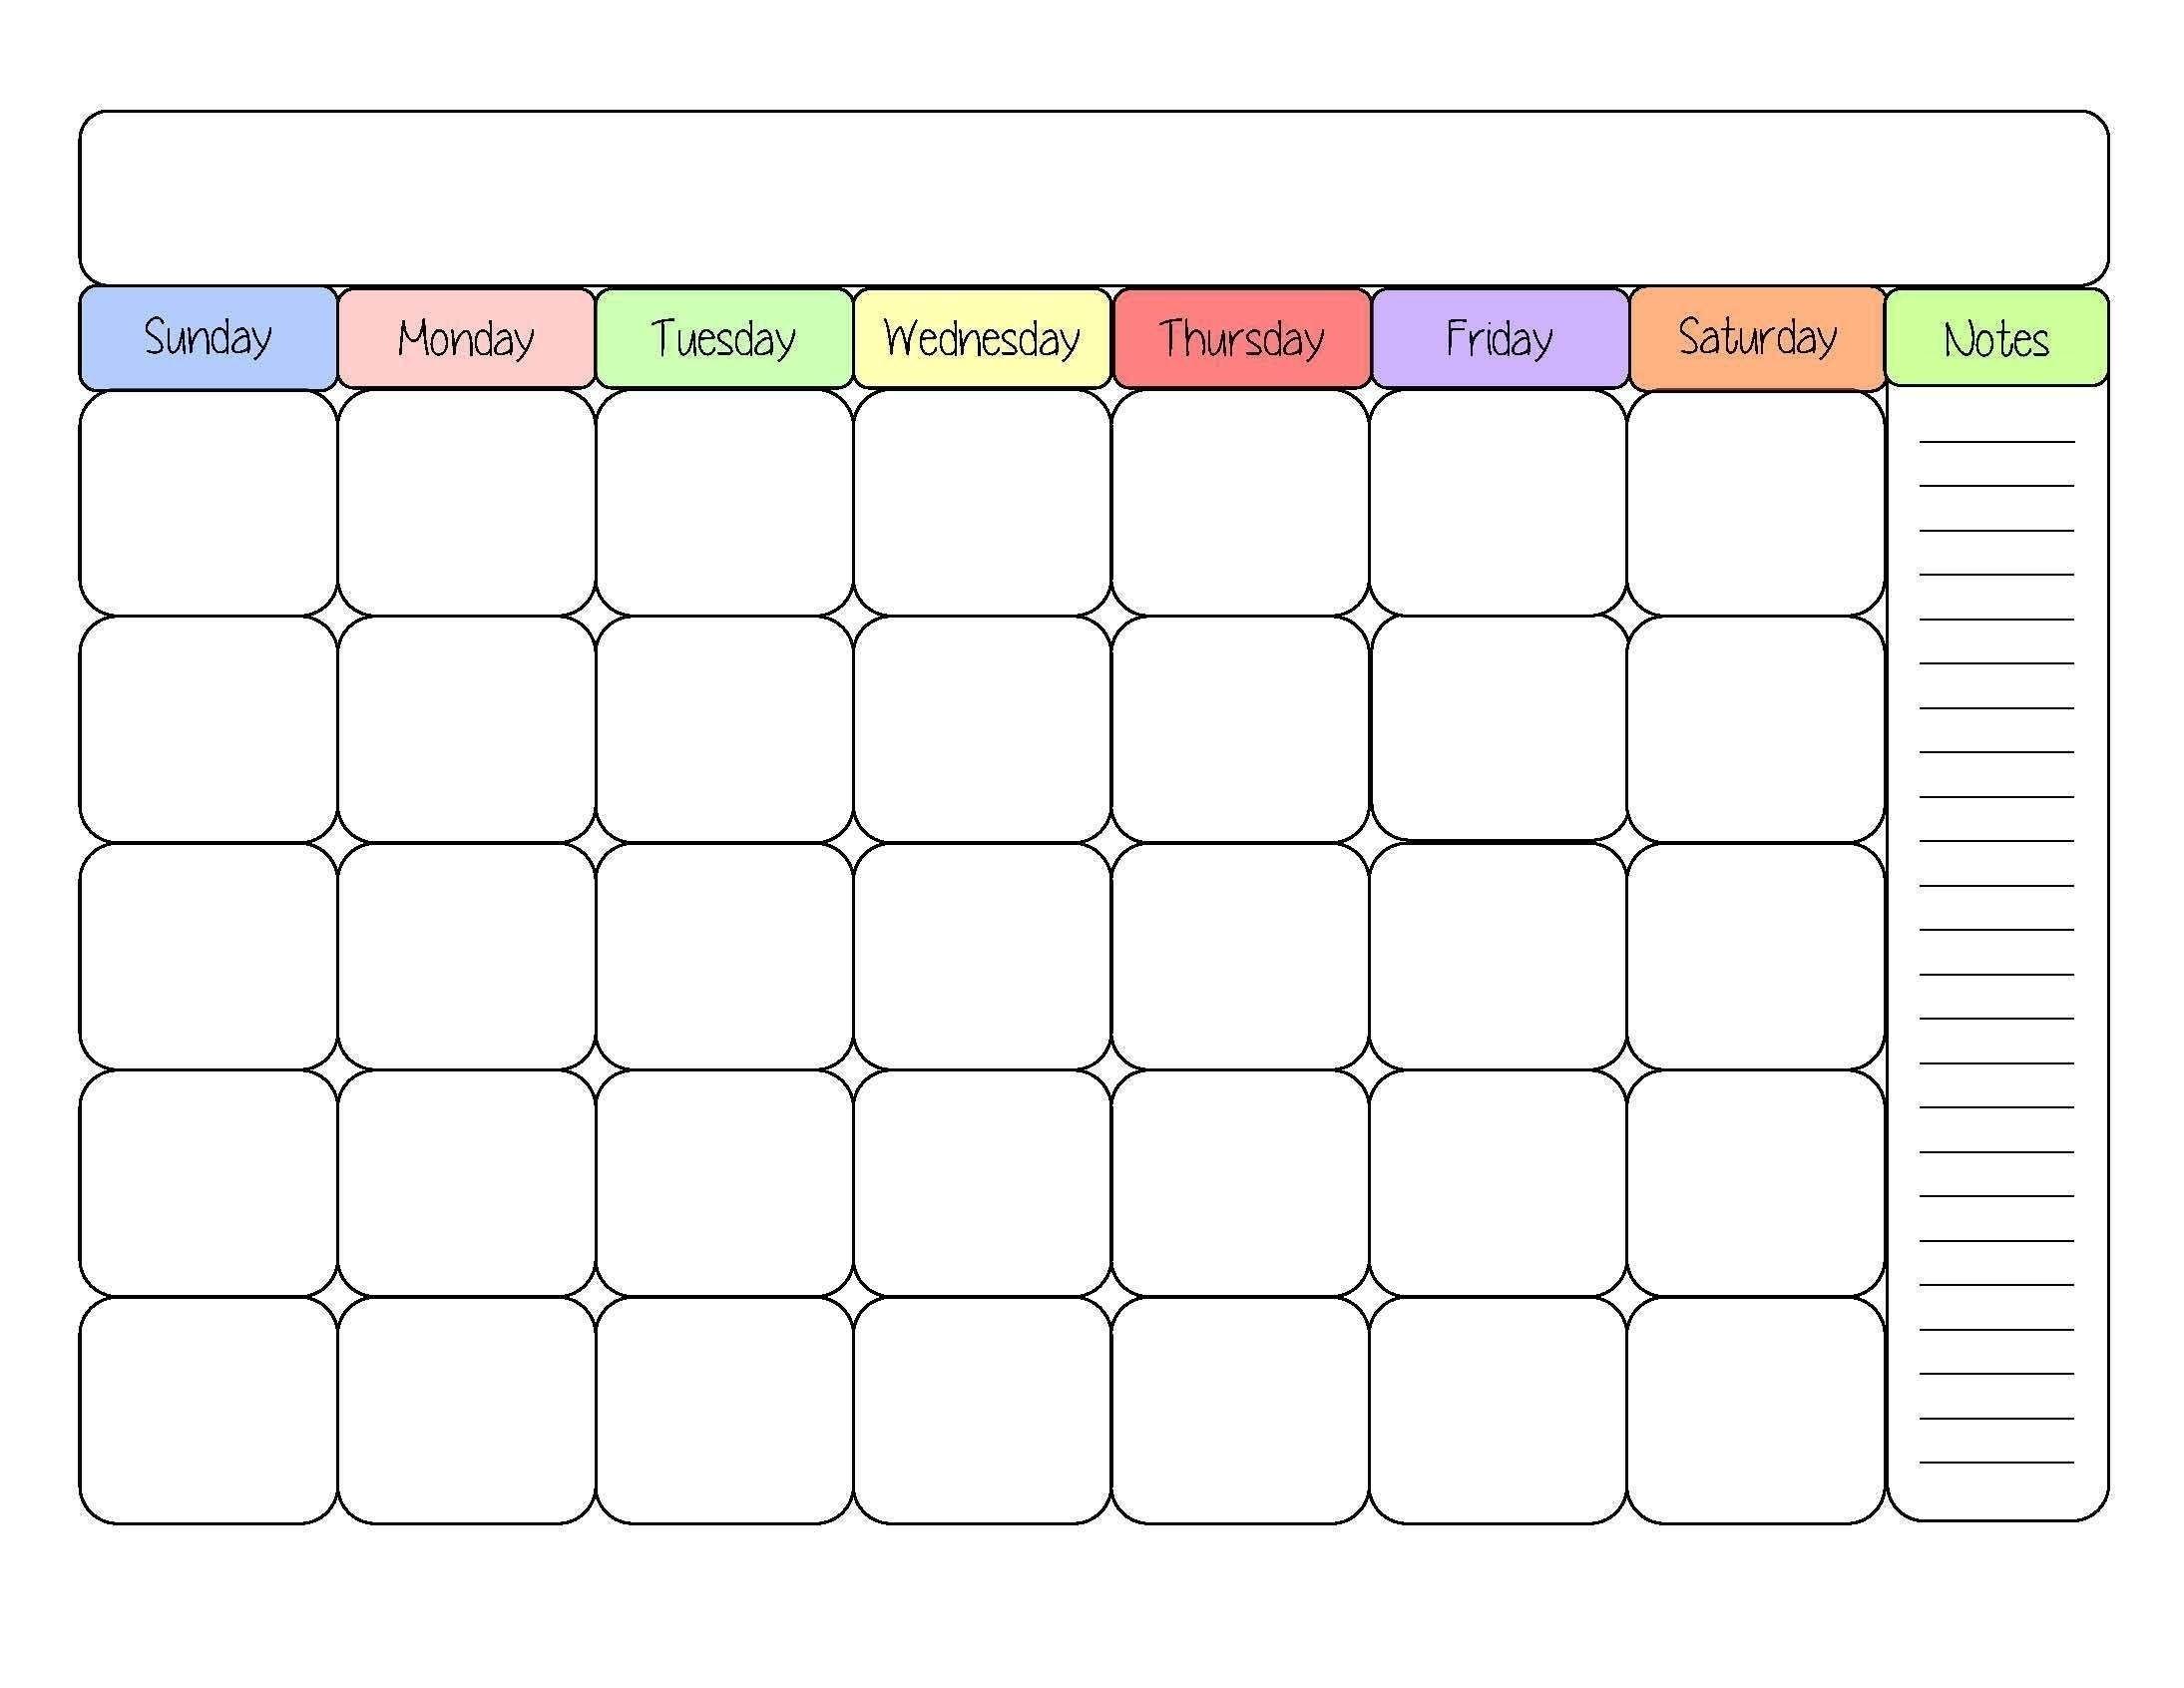 Blank Calendars In Blank Calendar Templates - Free Calendar